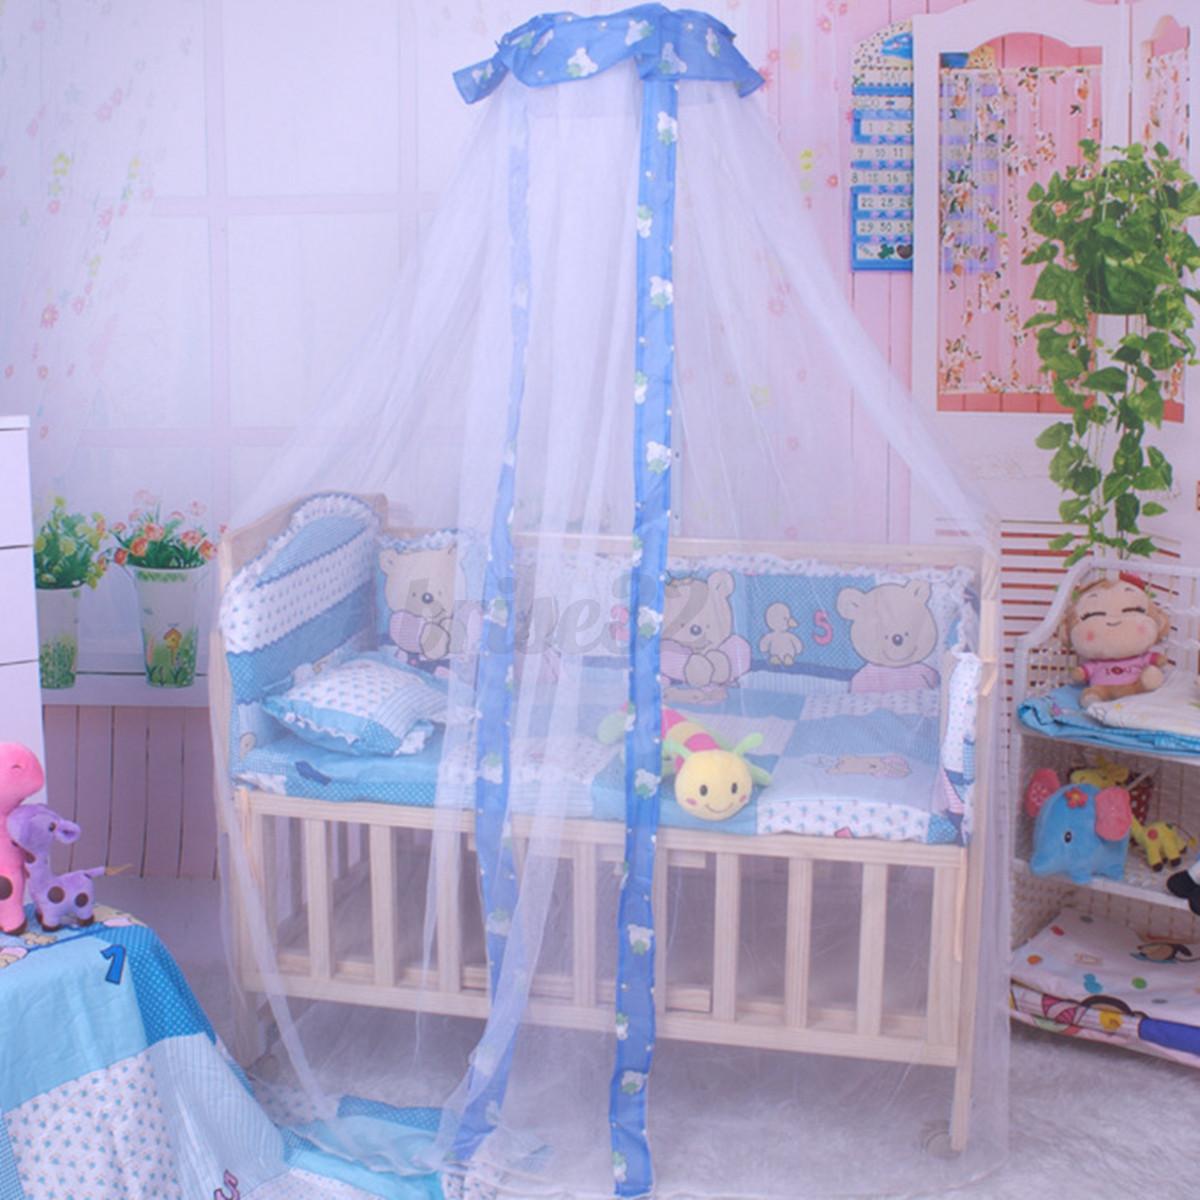 Baby-Infant-Nursery-Mosquito-Bedding-Crib-Canopy-Net- & Baby Infant Nursery Mosquito Bedding Crib Canopy Net Hanging Babe ...